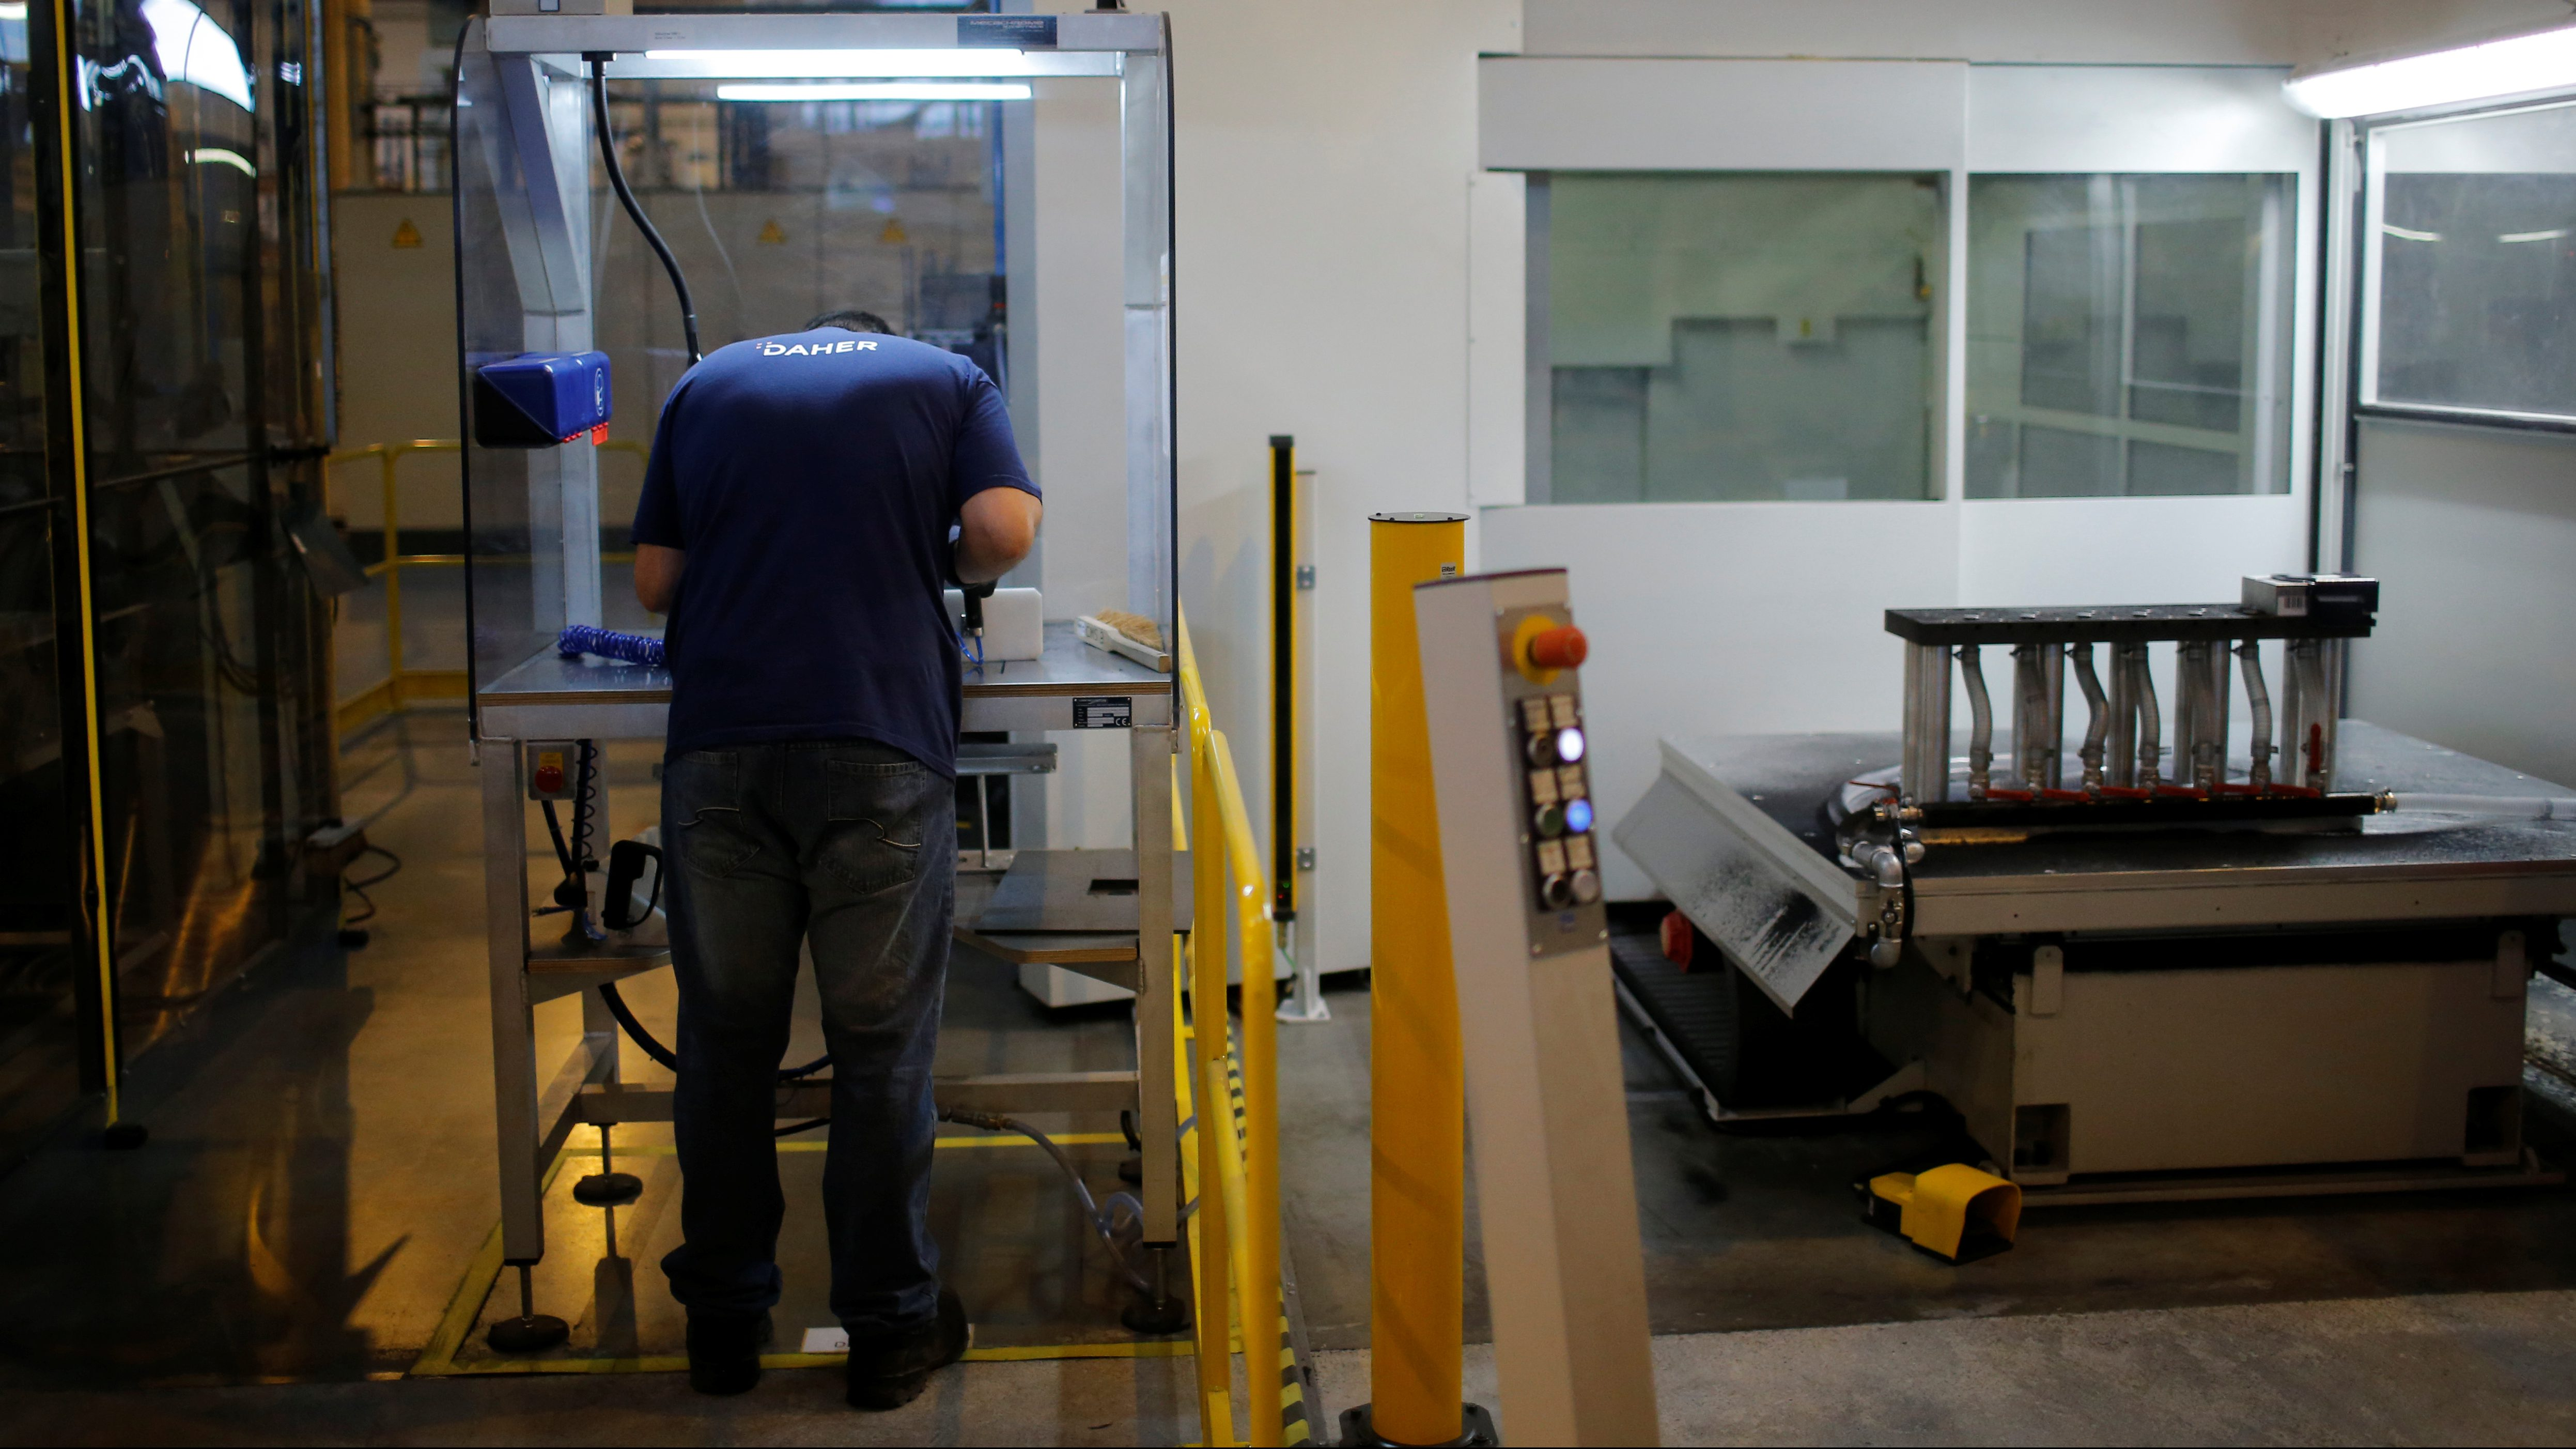 An employee works in the aerospace equipment maker Daher plant in Saint-Aignan-Grandlieu near Nantes